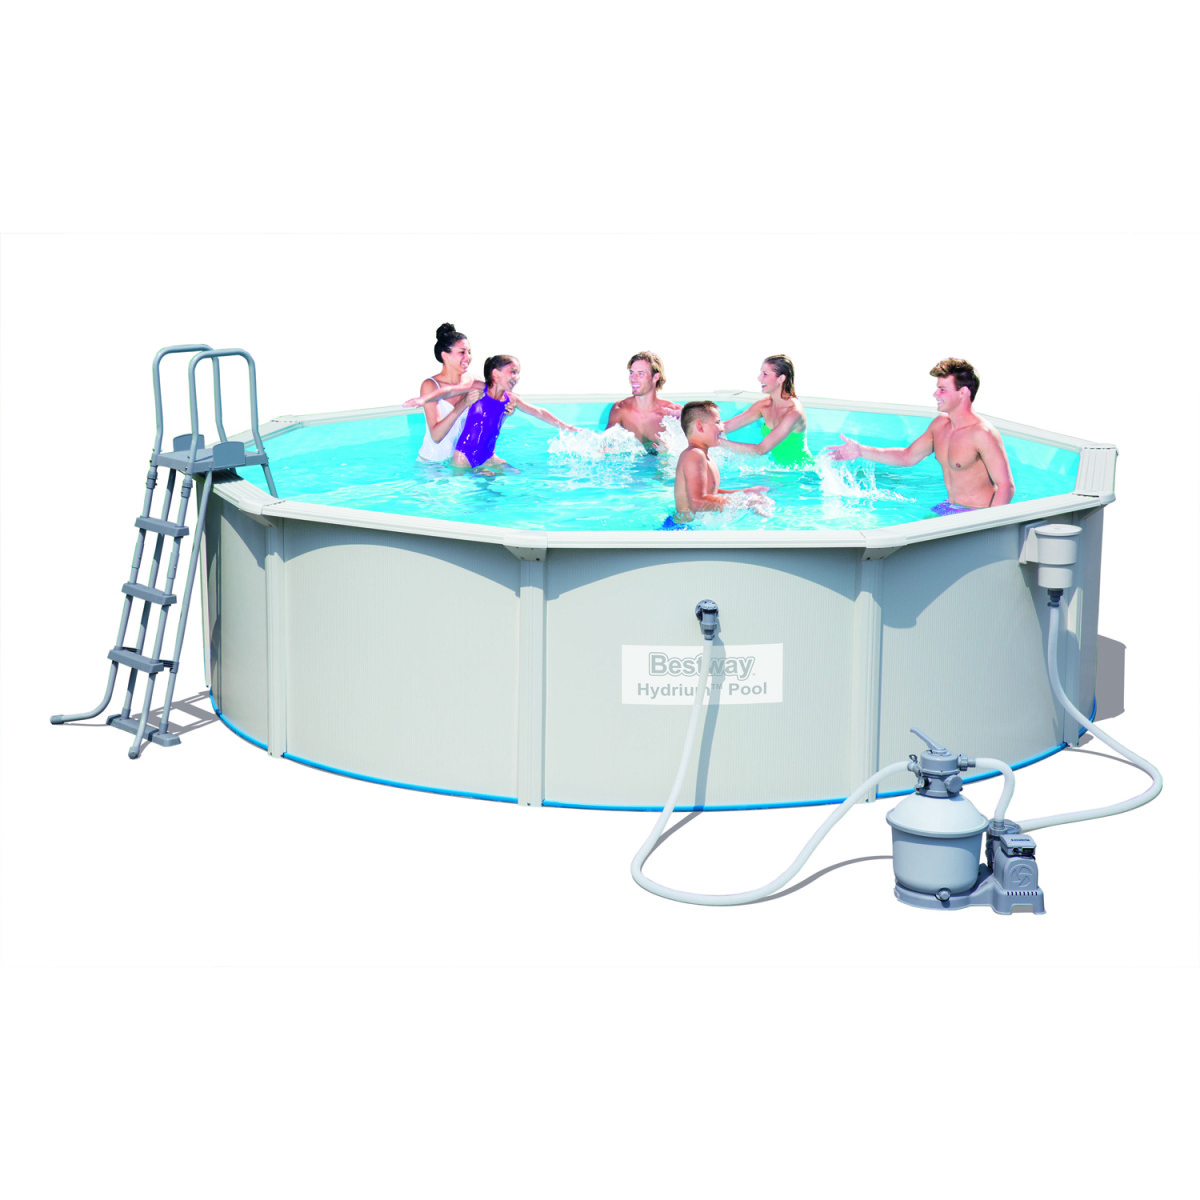 Сборный бассейн Bestway Hydrium Pool 56384 (460х120)